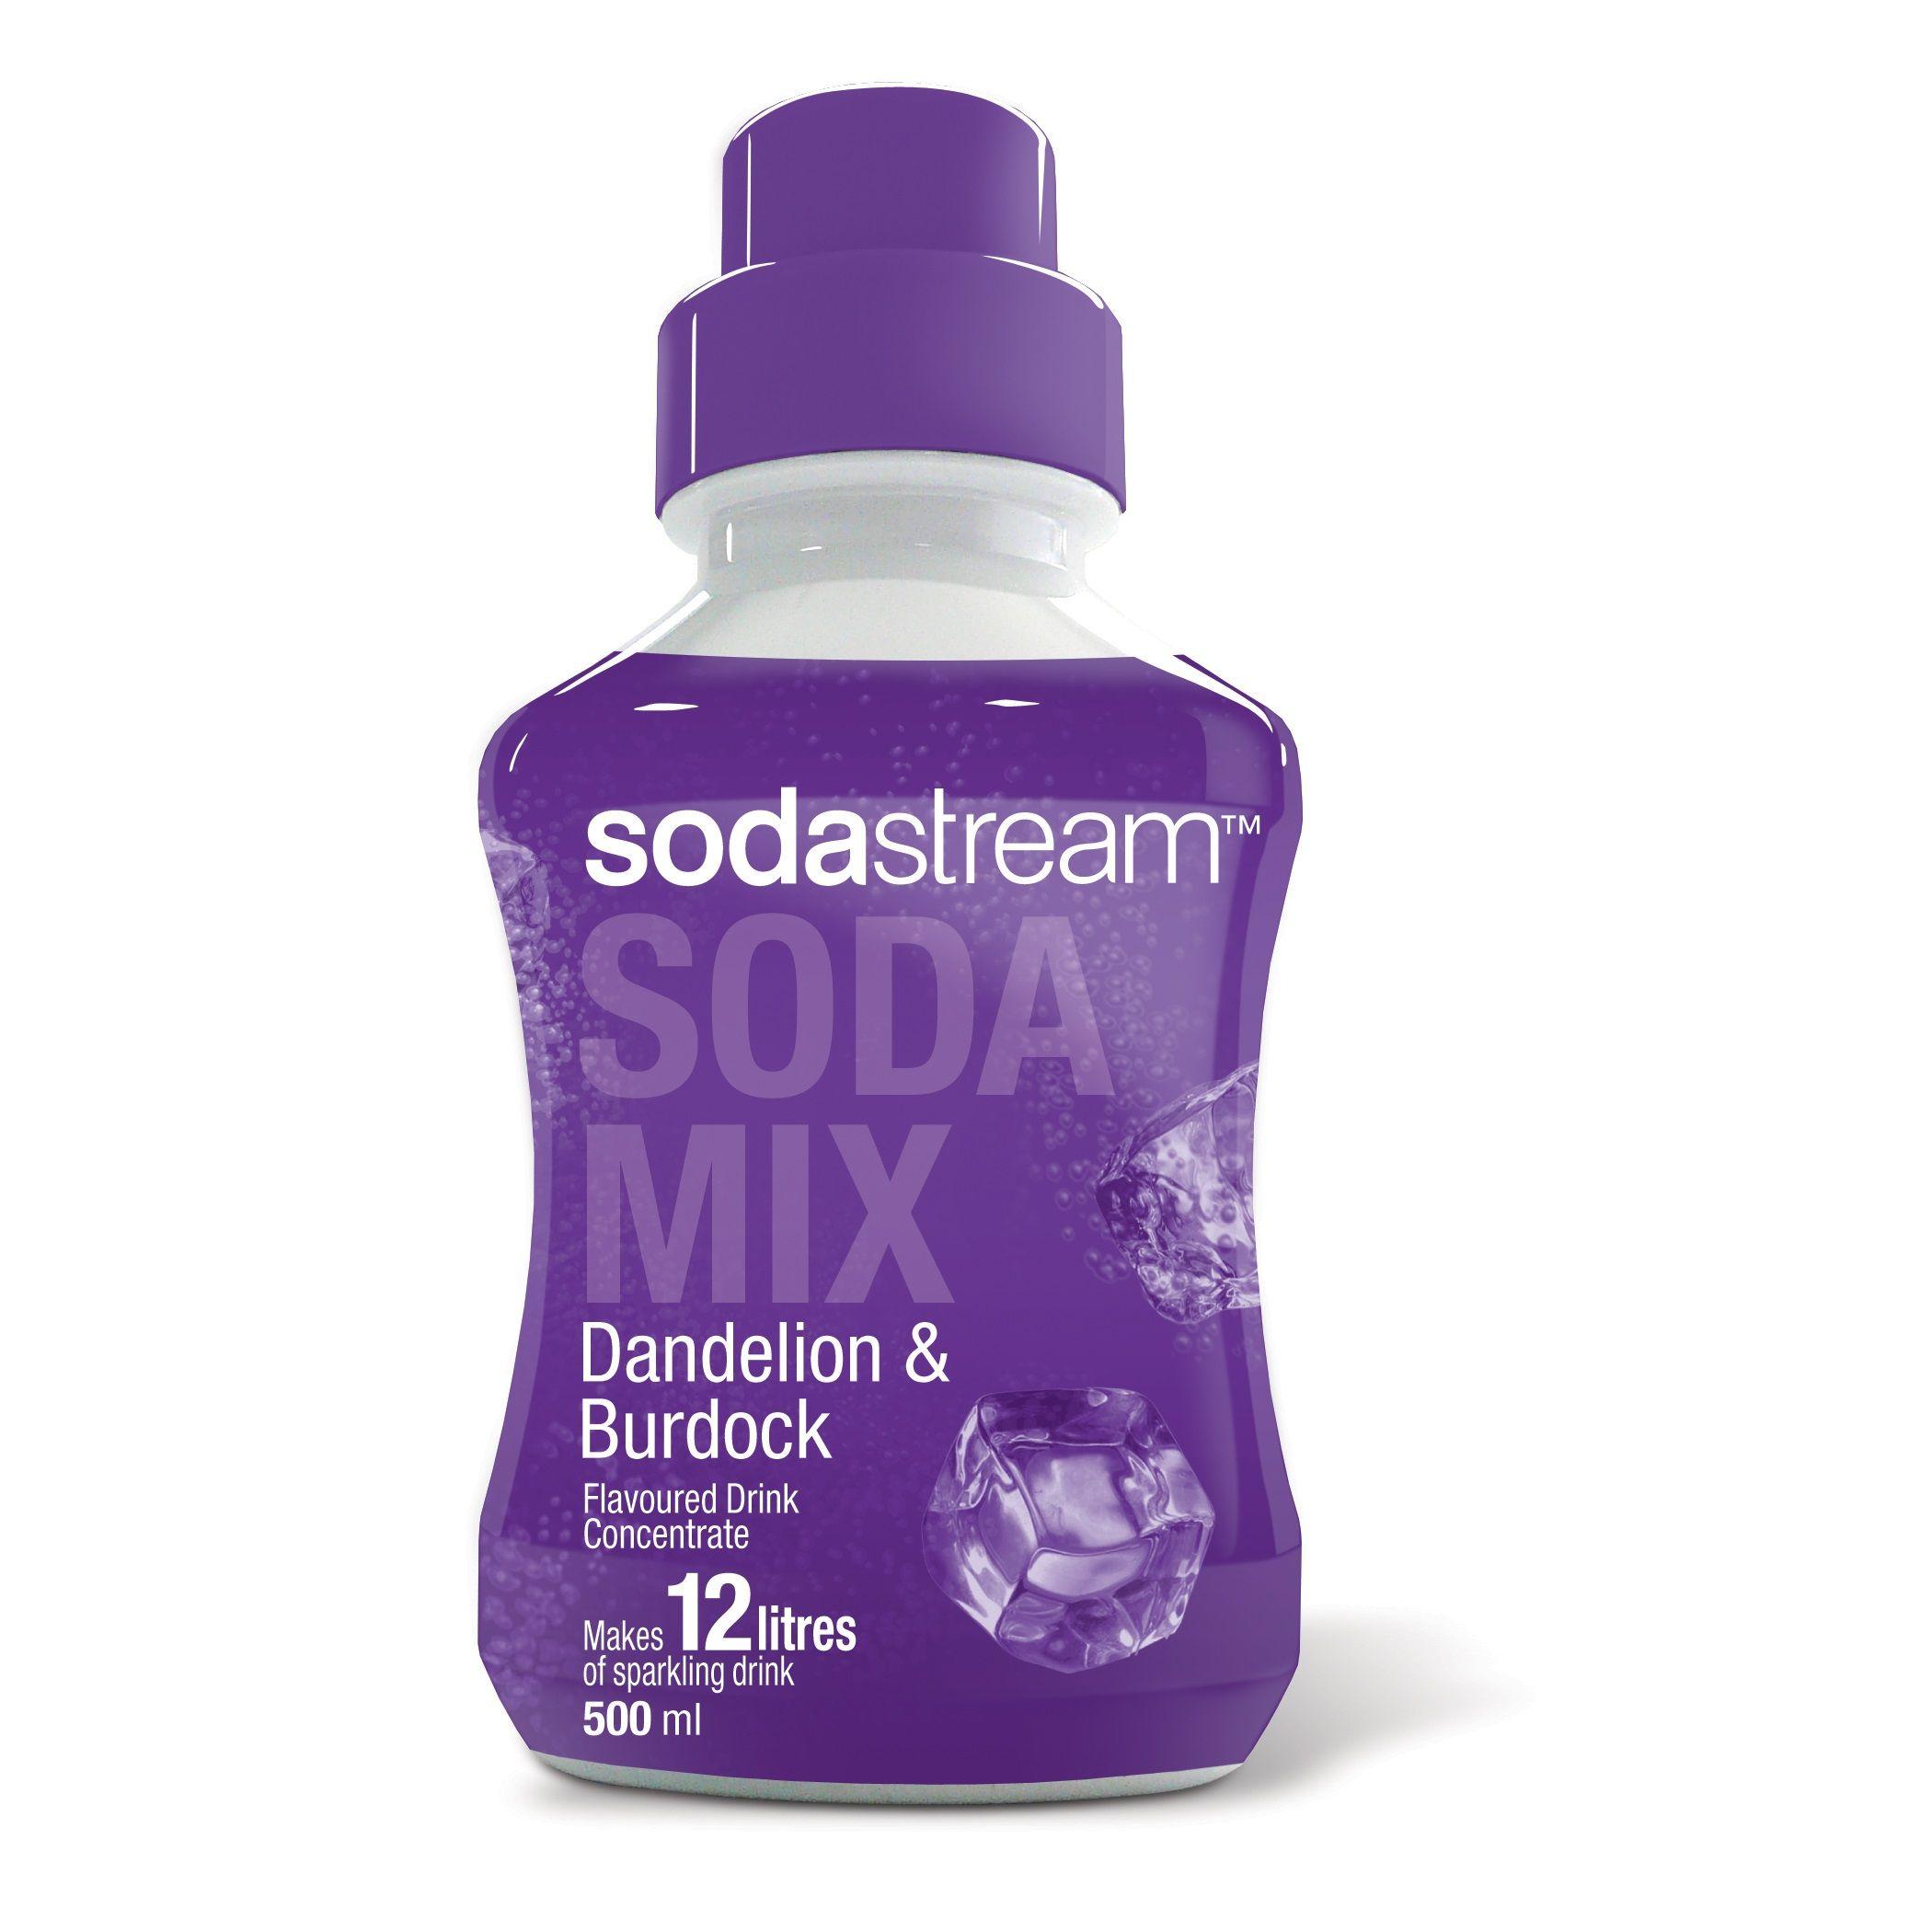 How To Make Dandelion And Burdock Drink